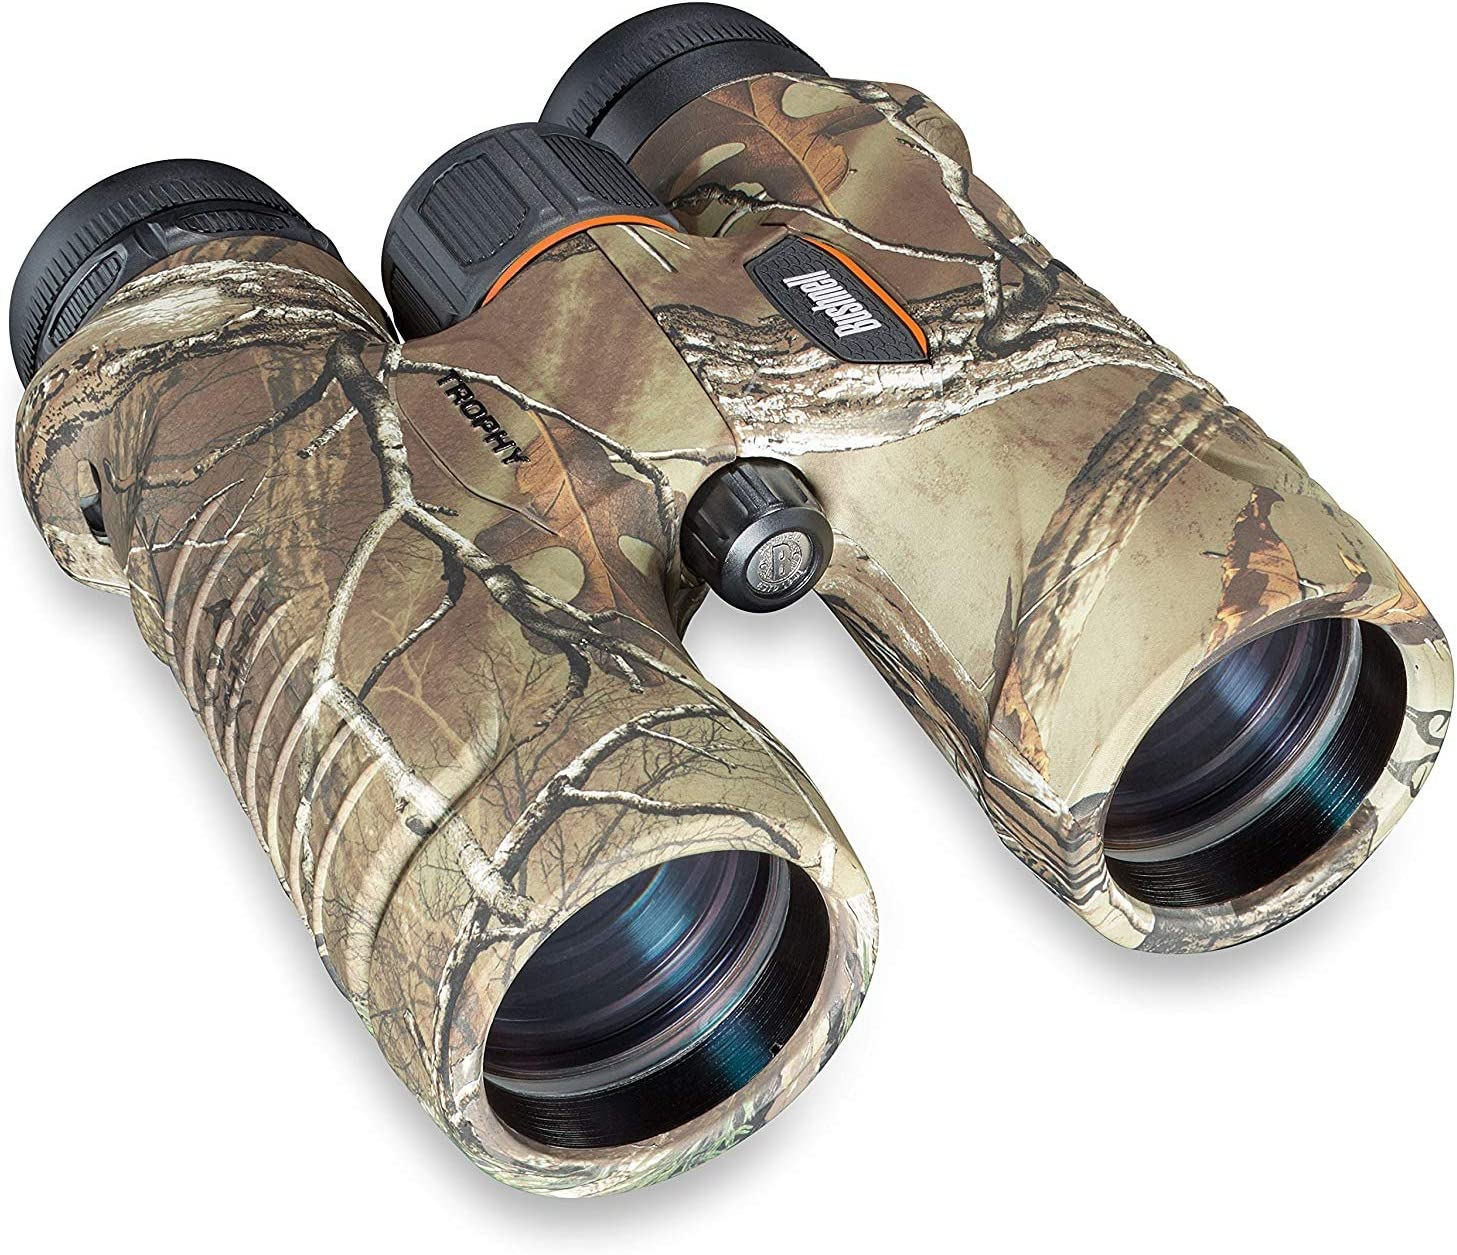 Bushnell Trophy Binocular, Realtree Xtra, 8 x 42mm